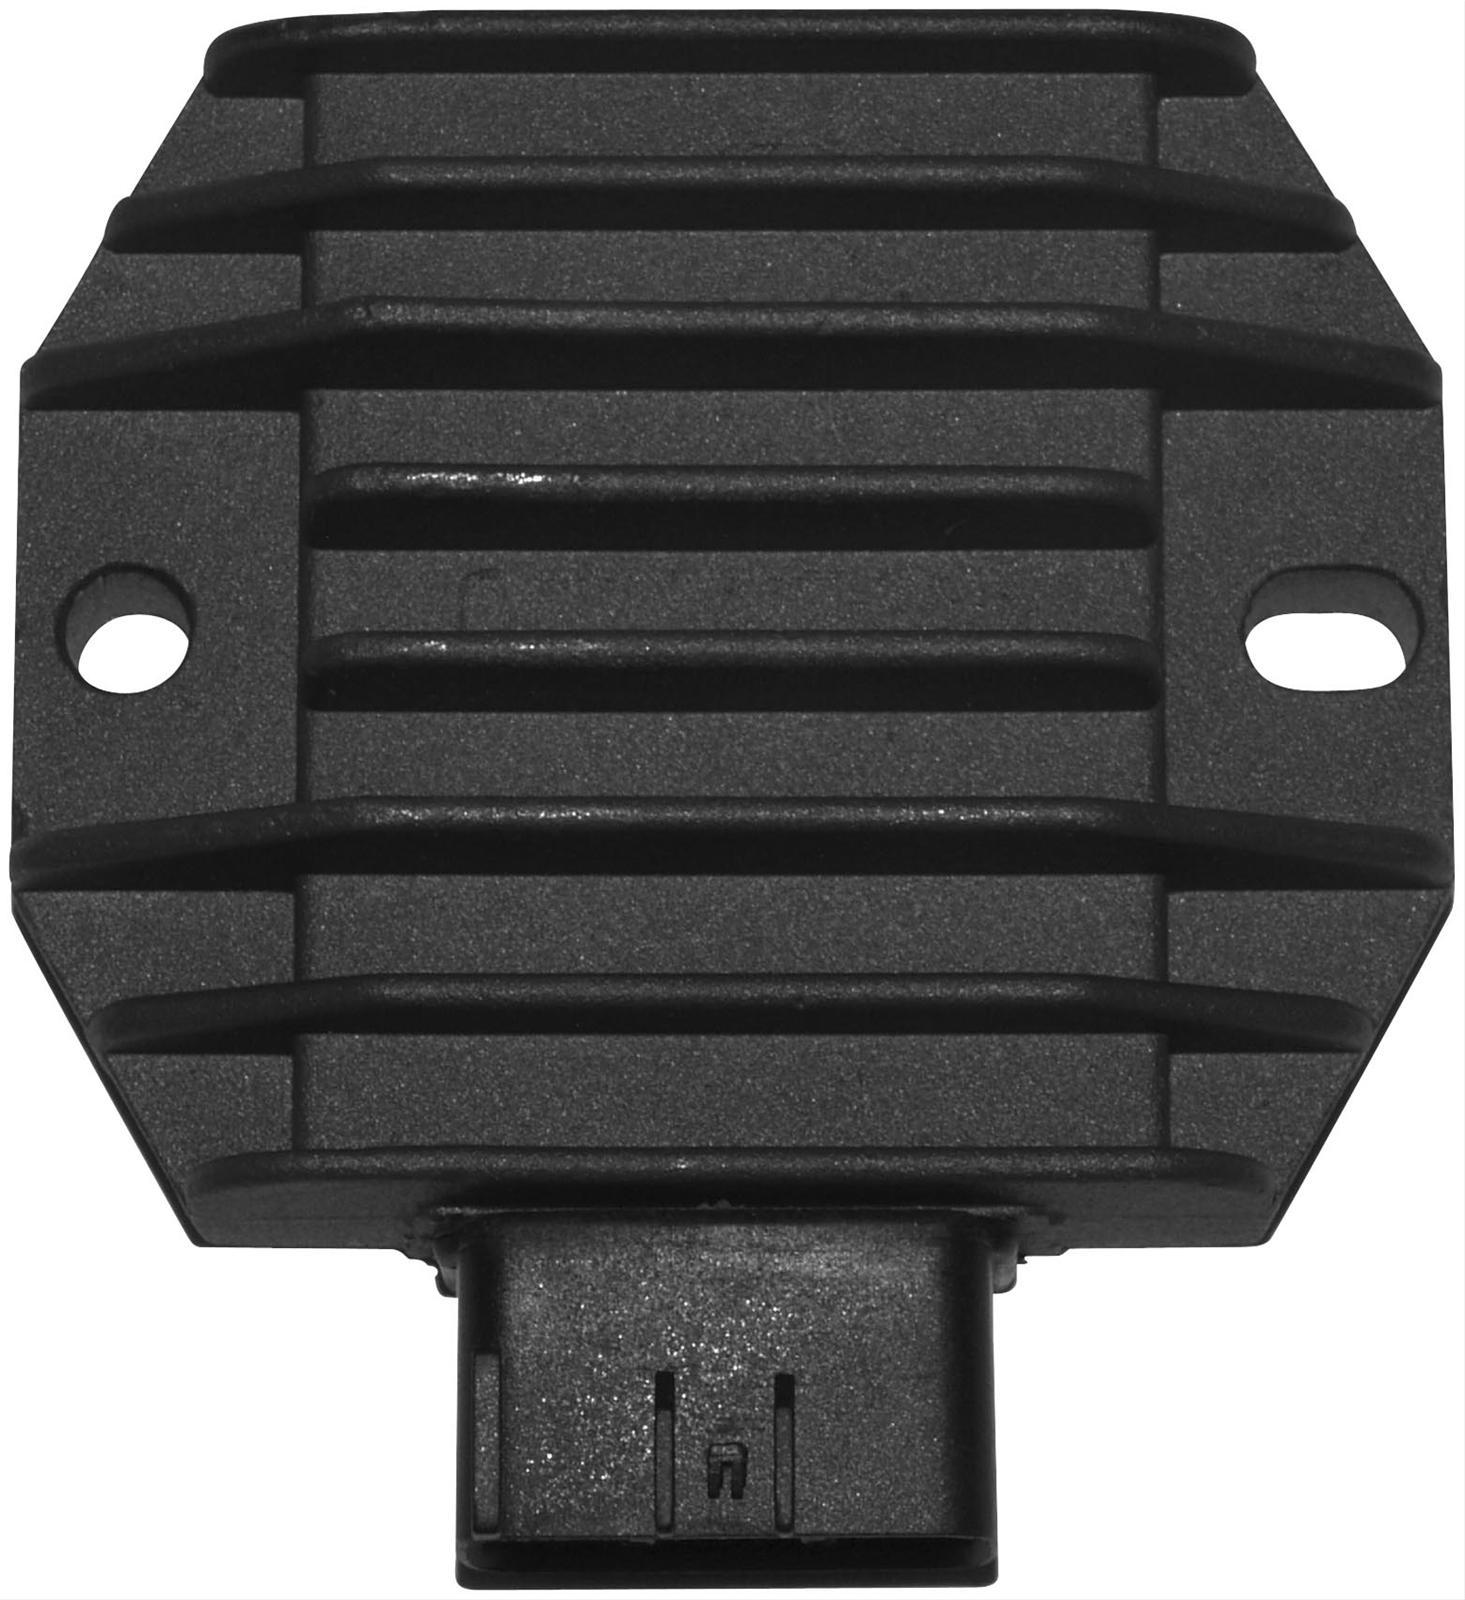 Suzuki Burgman 650 Fuse Box Wiring Harness Wiring Diagram